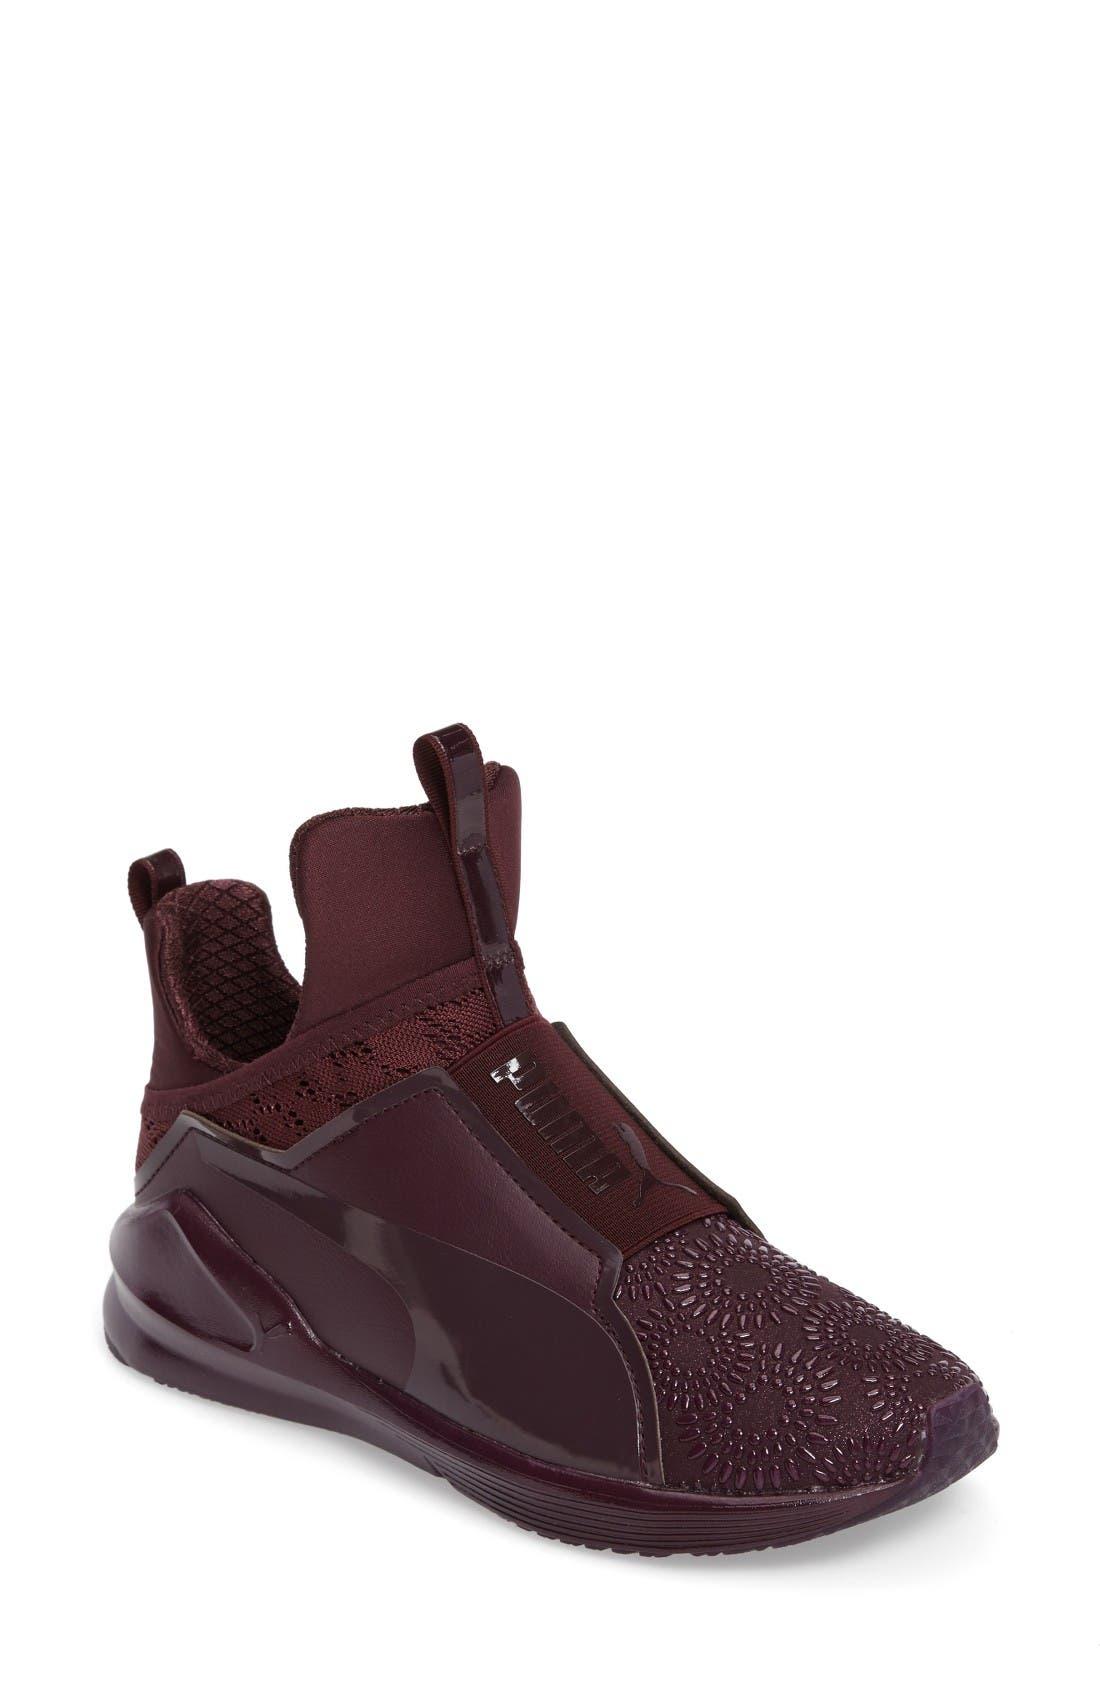 Fierce KRM High Top Sneaker,                         Main,                         color, Red Plum